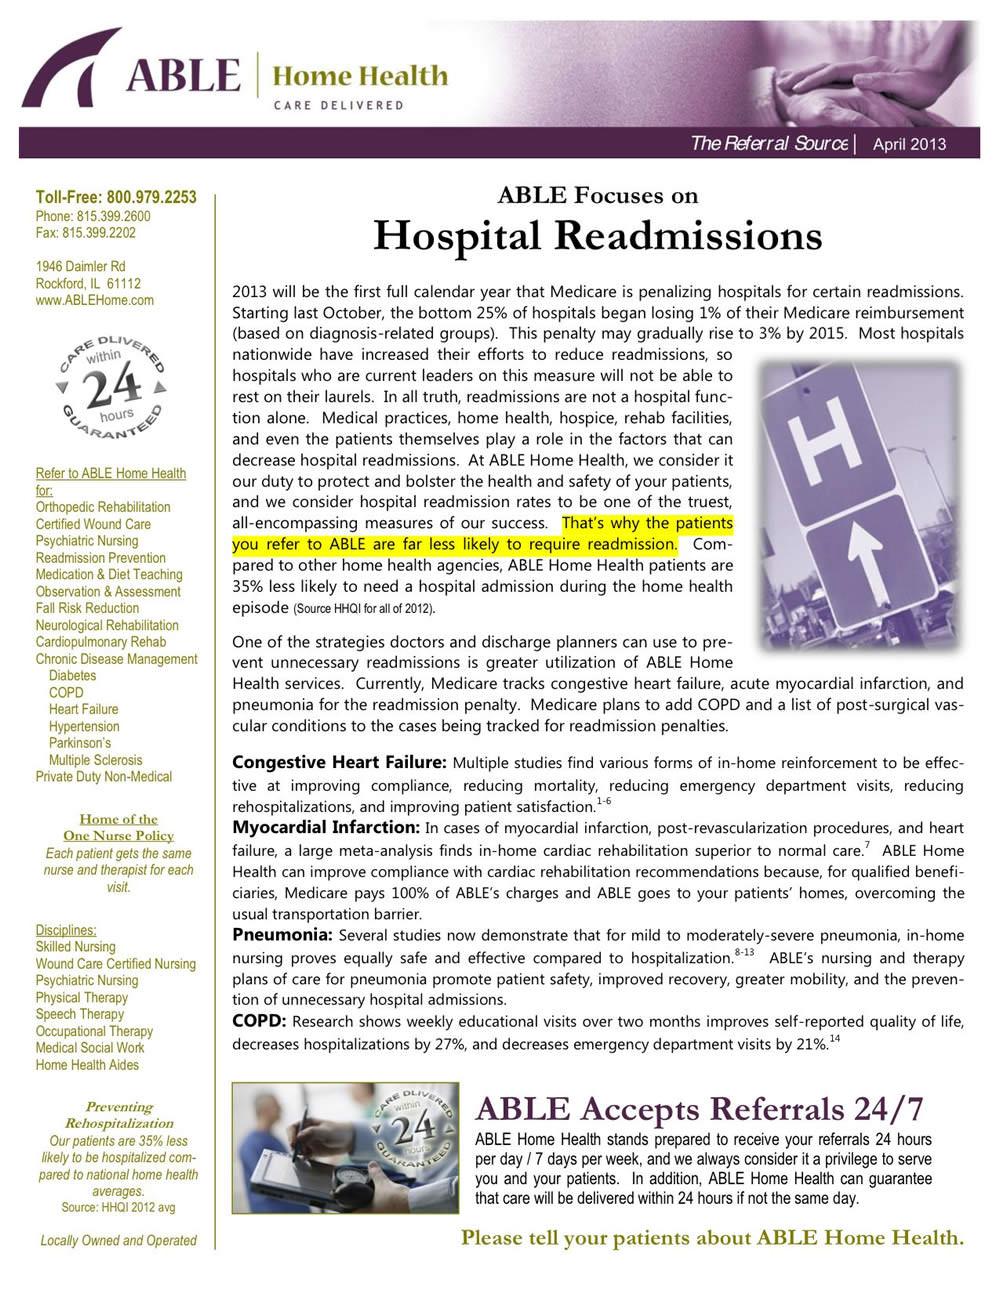 HospReadmissions-1